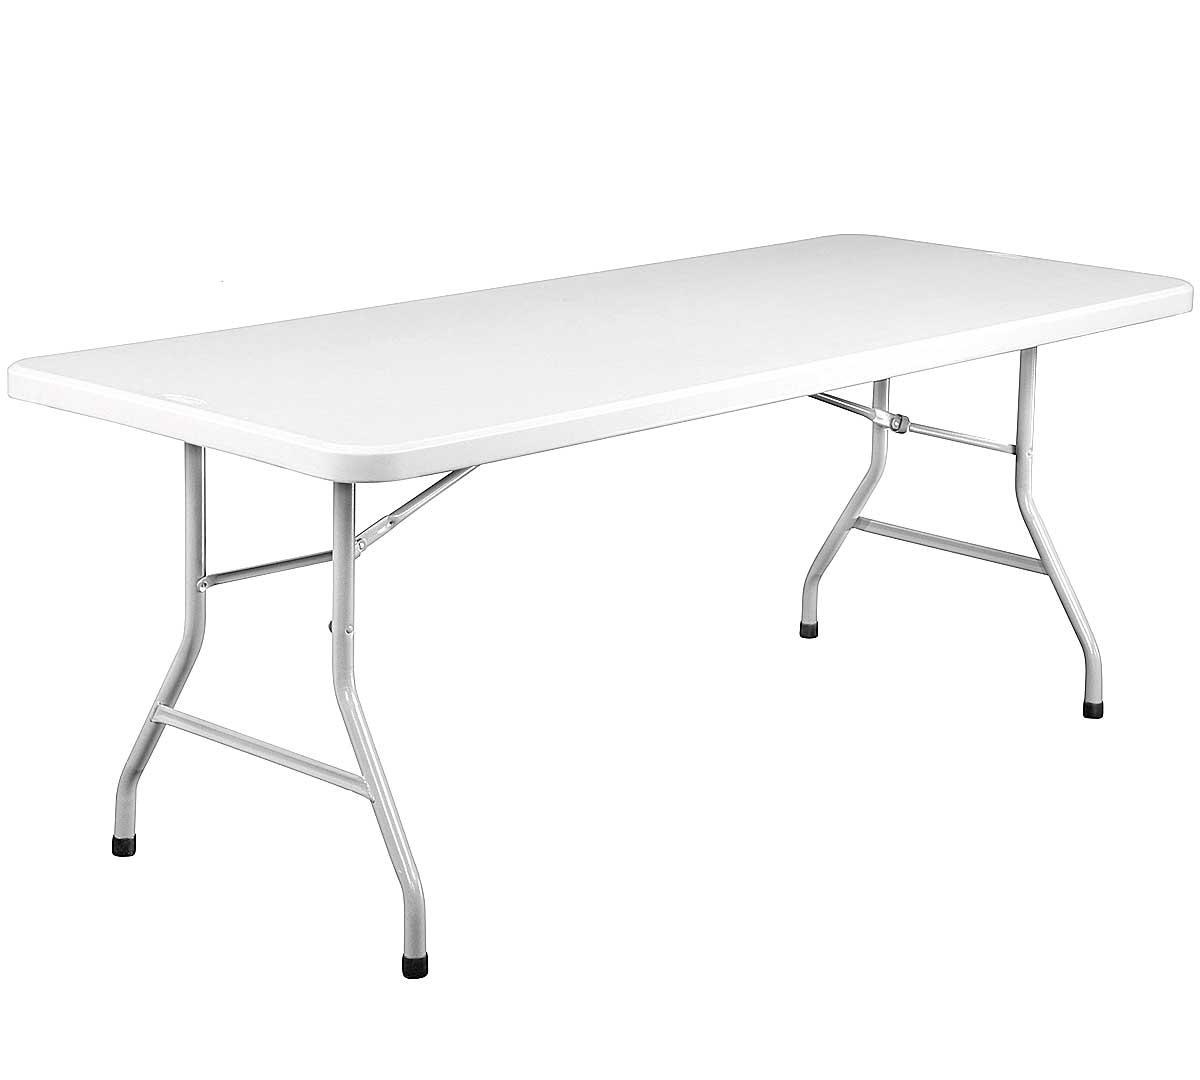 Mesa plegable resina good mesa plegable resinaacero funny - Mesa de resina plegable ...